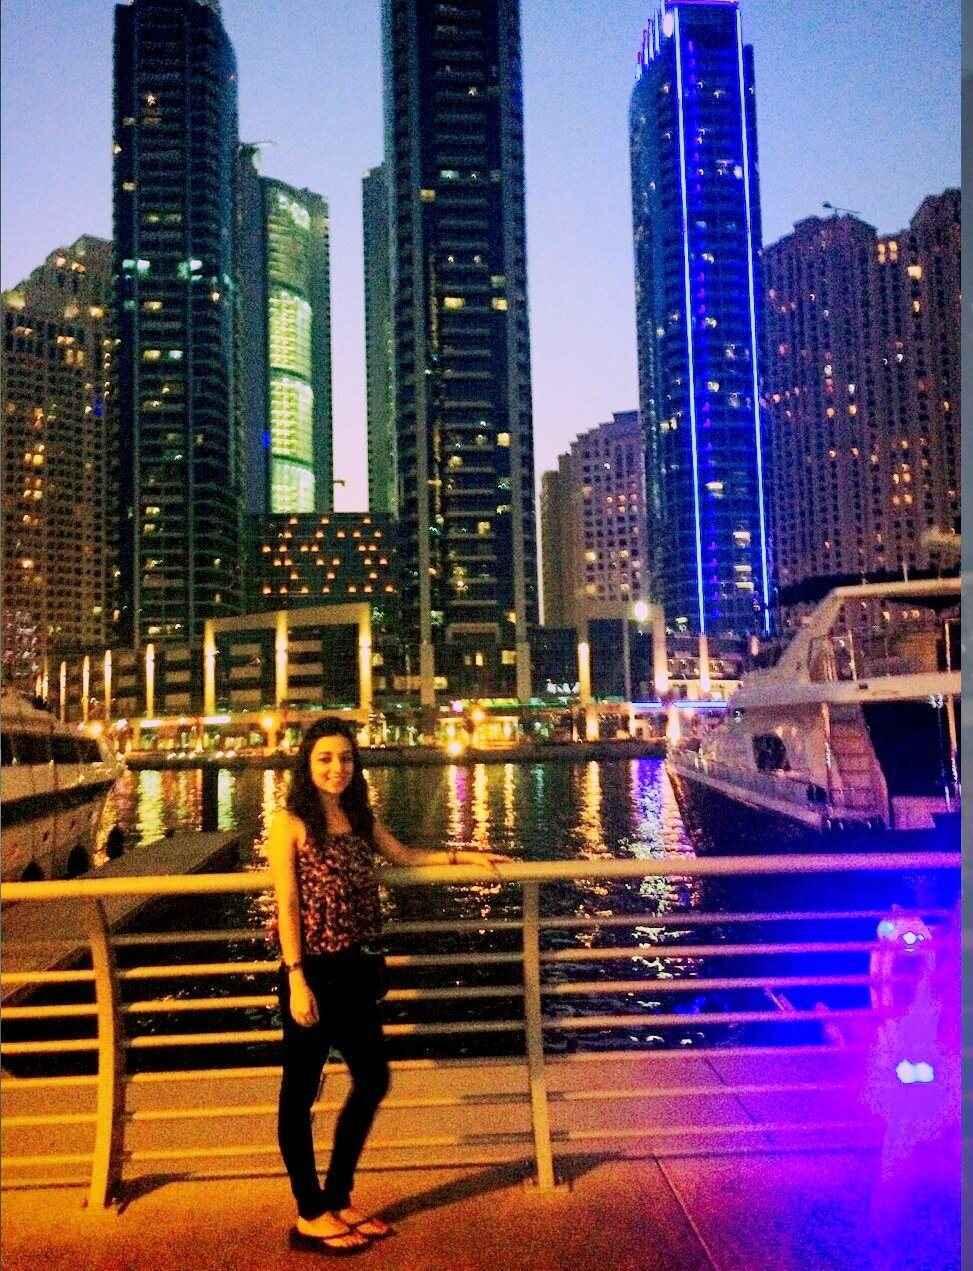 Dubai - Not just a shopper's paradise!